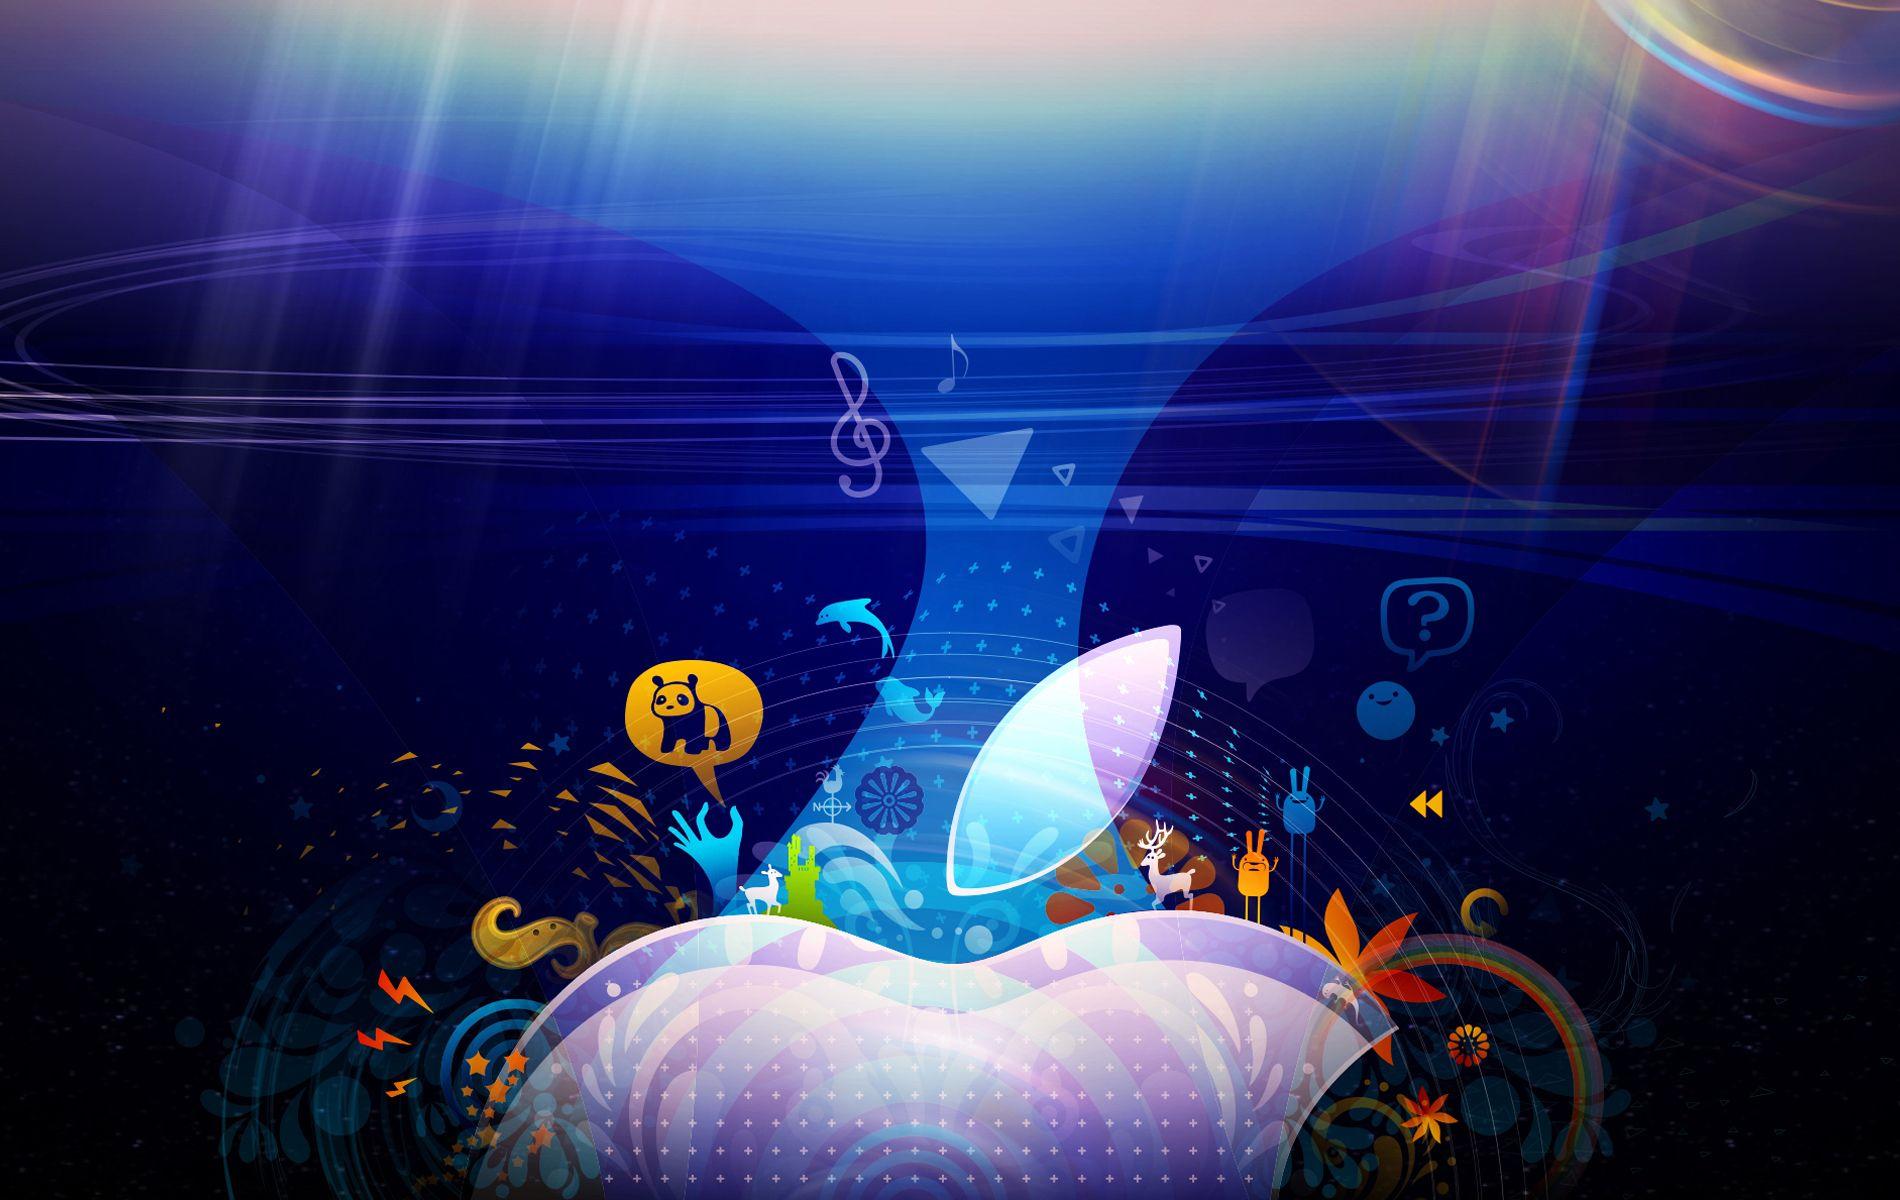 My Colorful Snow Leopard By Chicho21net Deviantart Com Retina Wallpaper Imac Wallpaper Mac Wallpaper